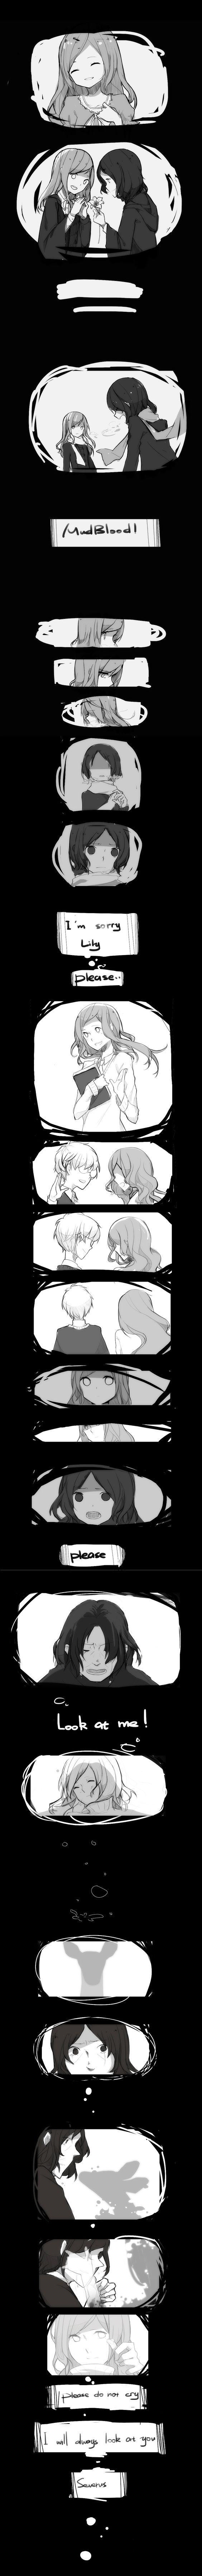 Severus Snape, Lily Evans: